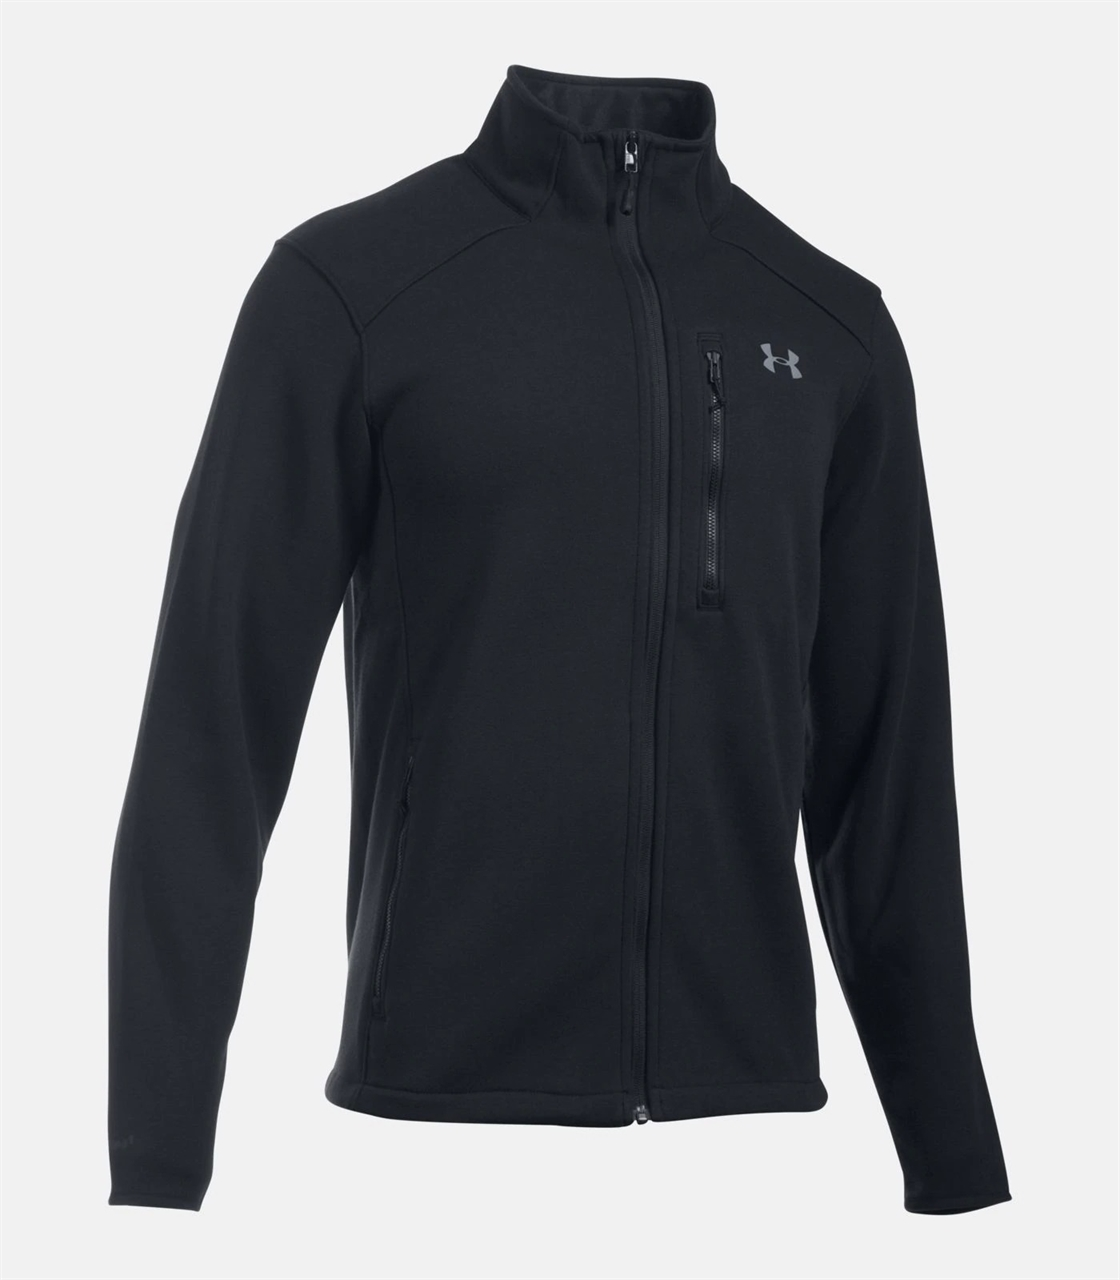 Picture of Under Armour Men's Granite Jacket